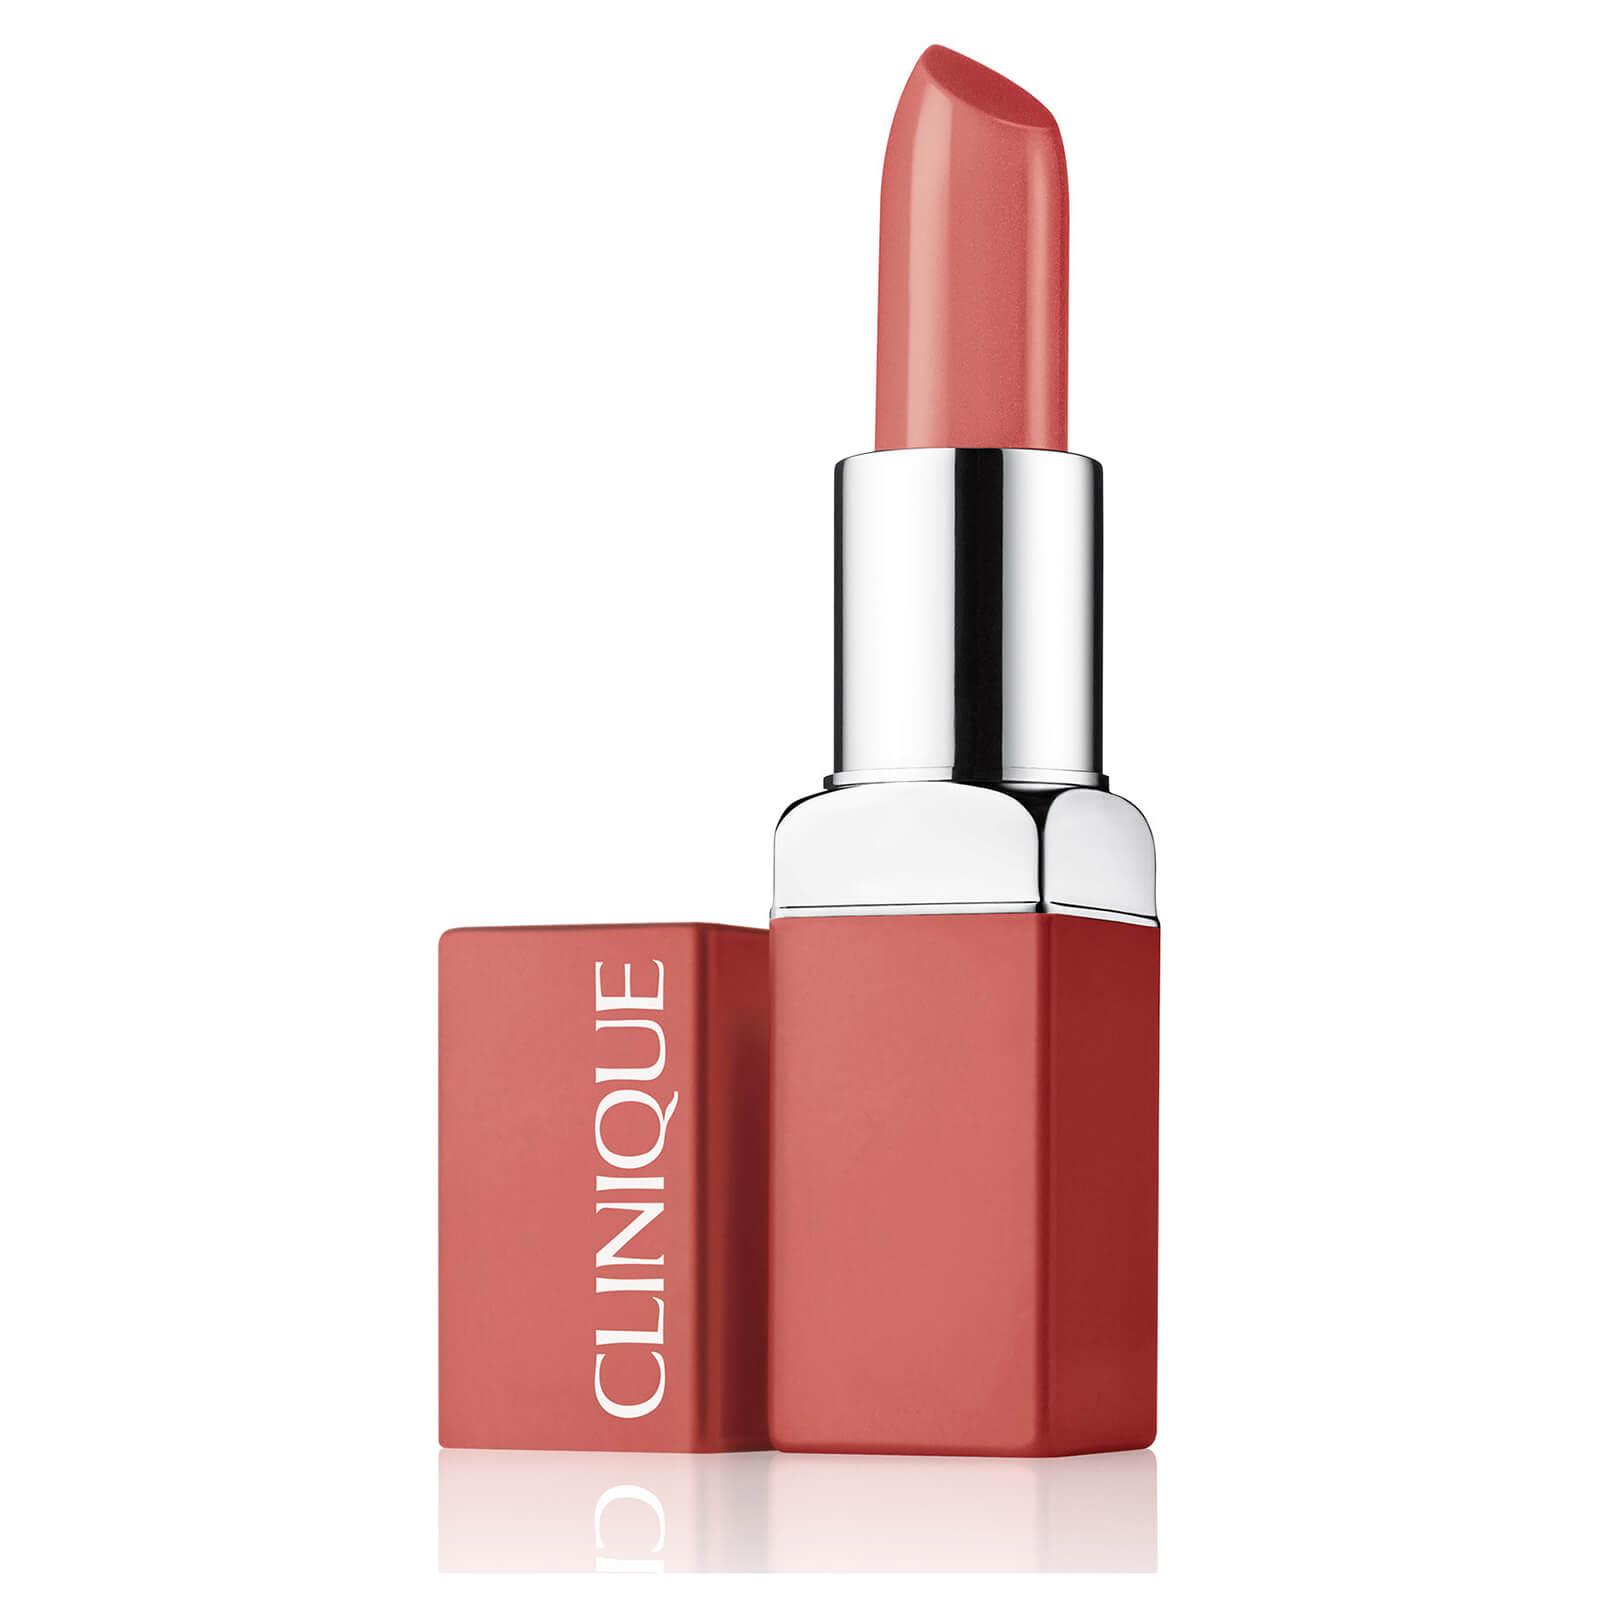 Clinique Even Better Pop Lip (Various Shades) - Heavenly